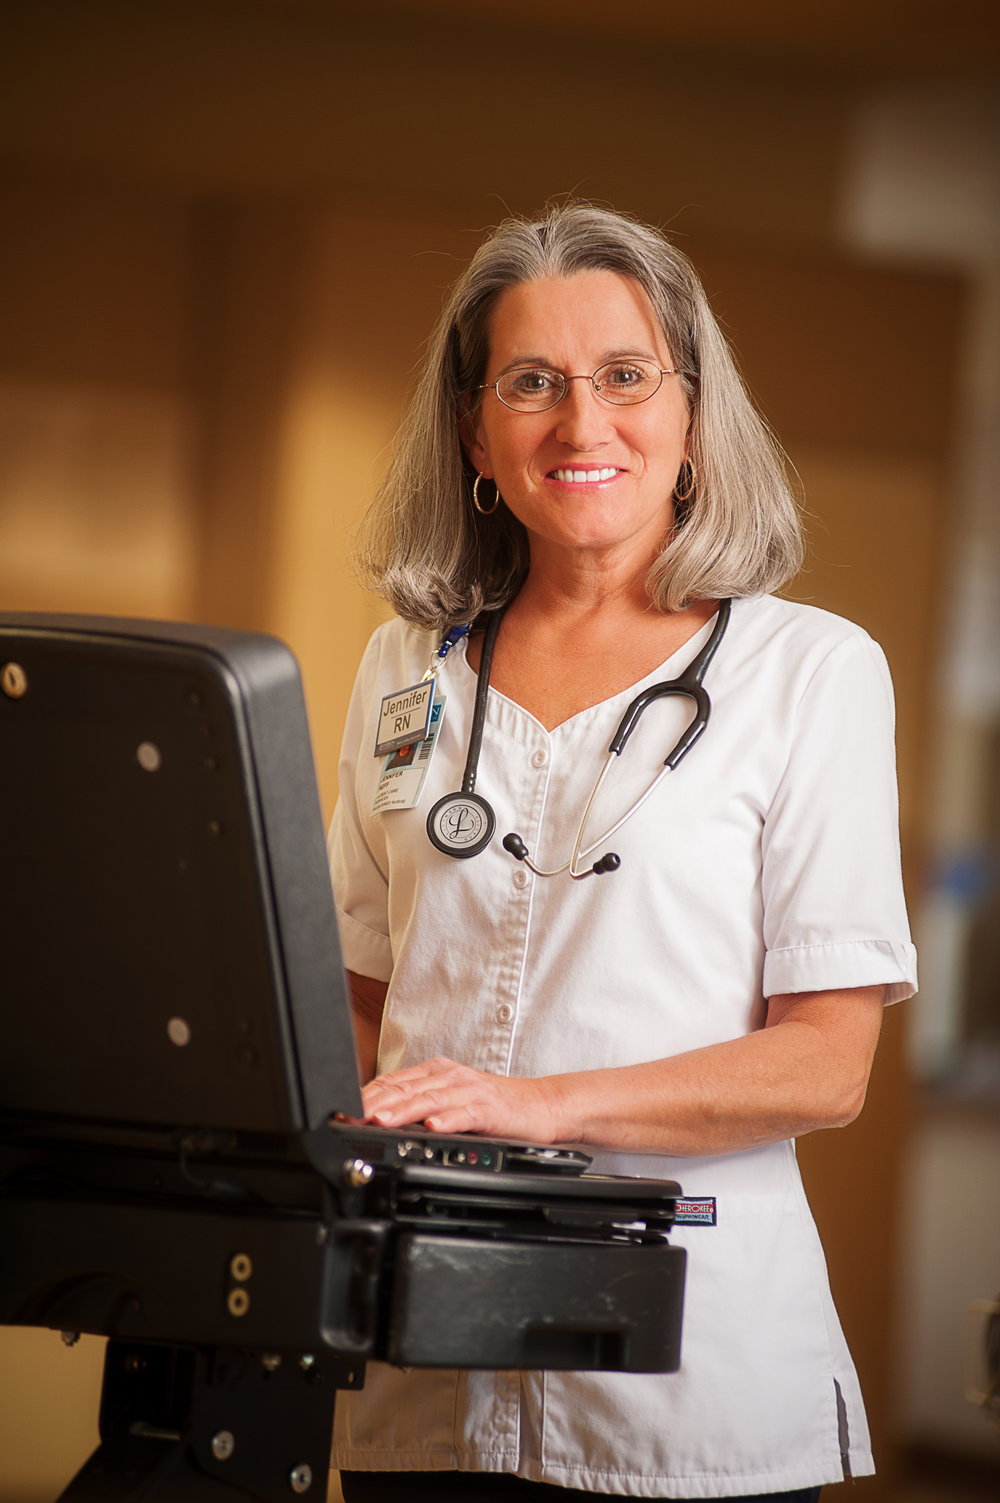 120507_JRMC_Nurse_50.jpg